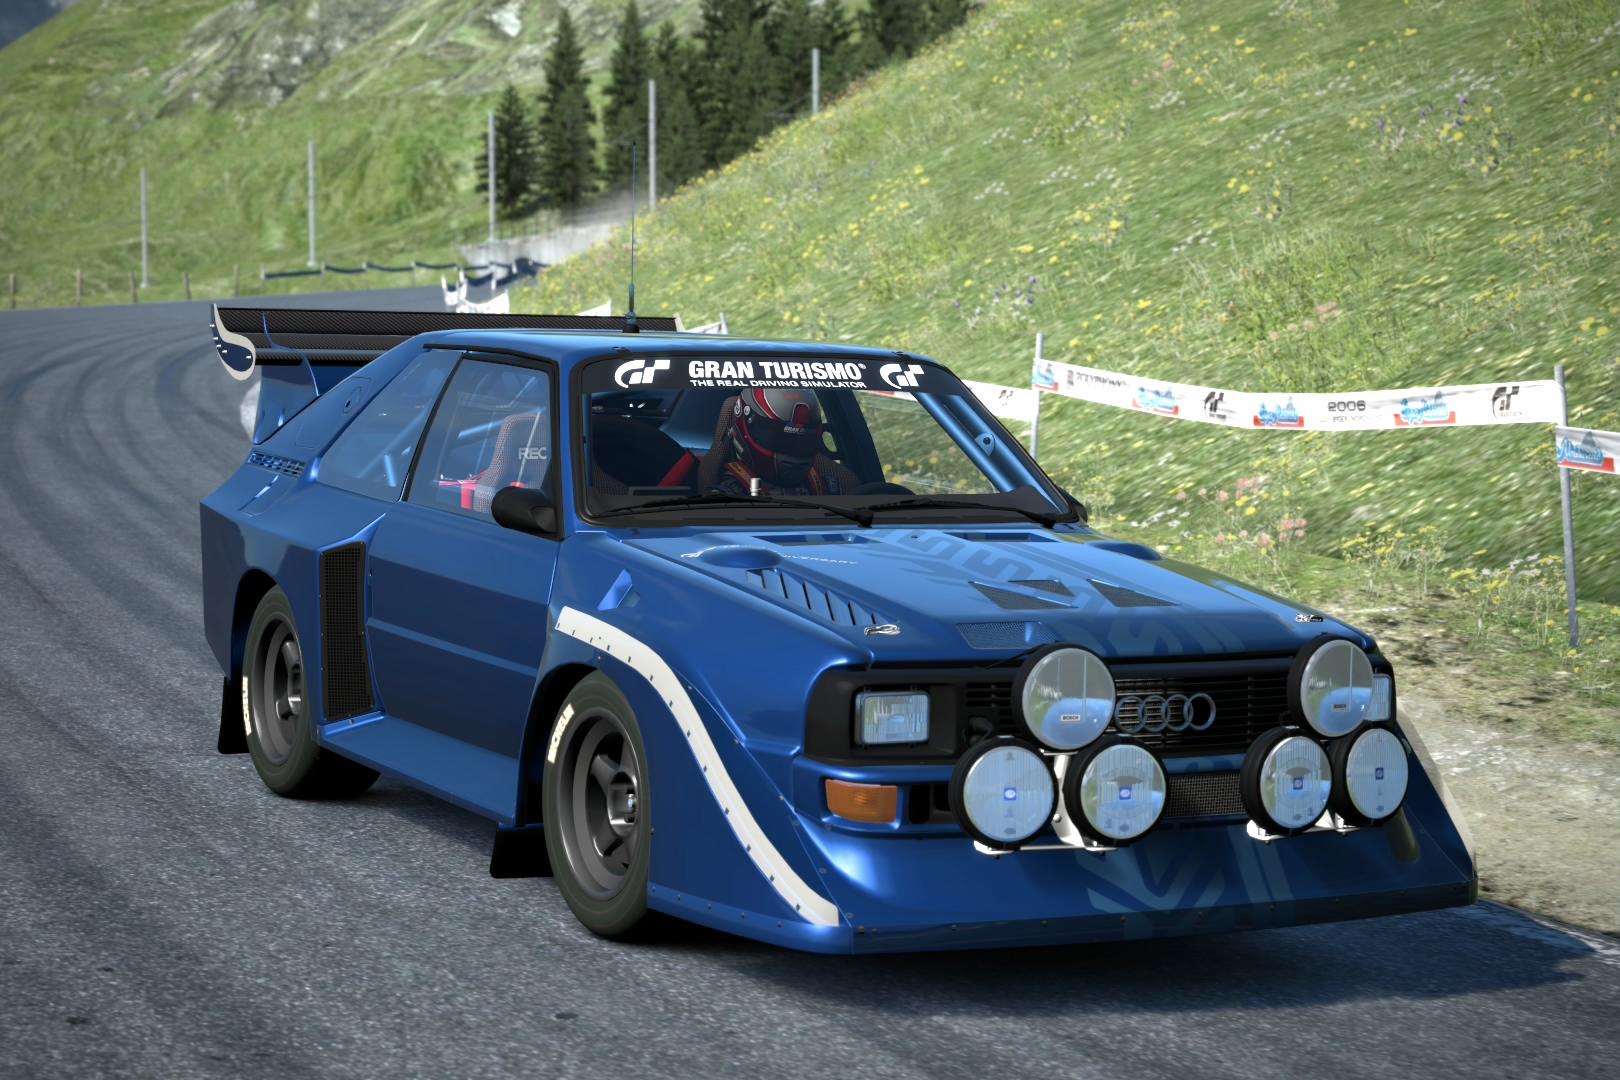 image audi sport quattro s1 rally car 15th anniversary. Black Bedroom Furniture Sets. Home Design Ideas